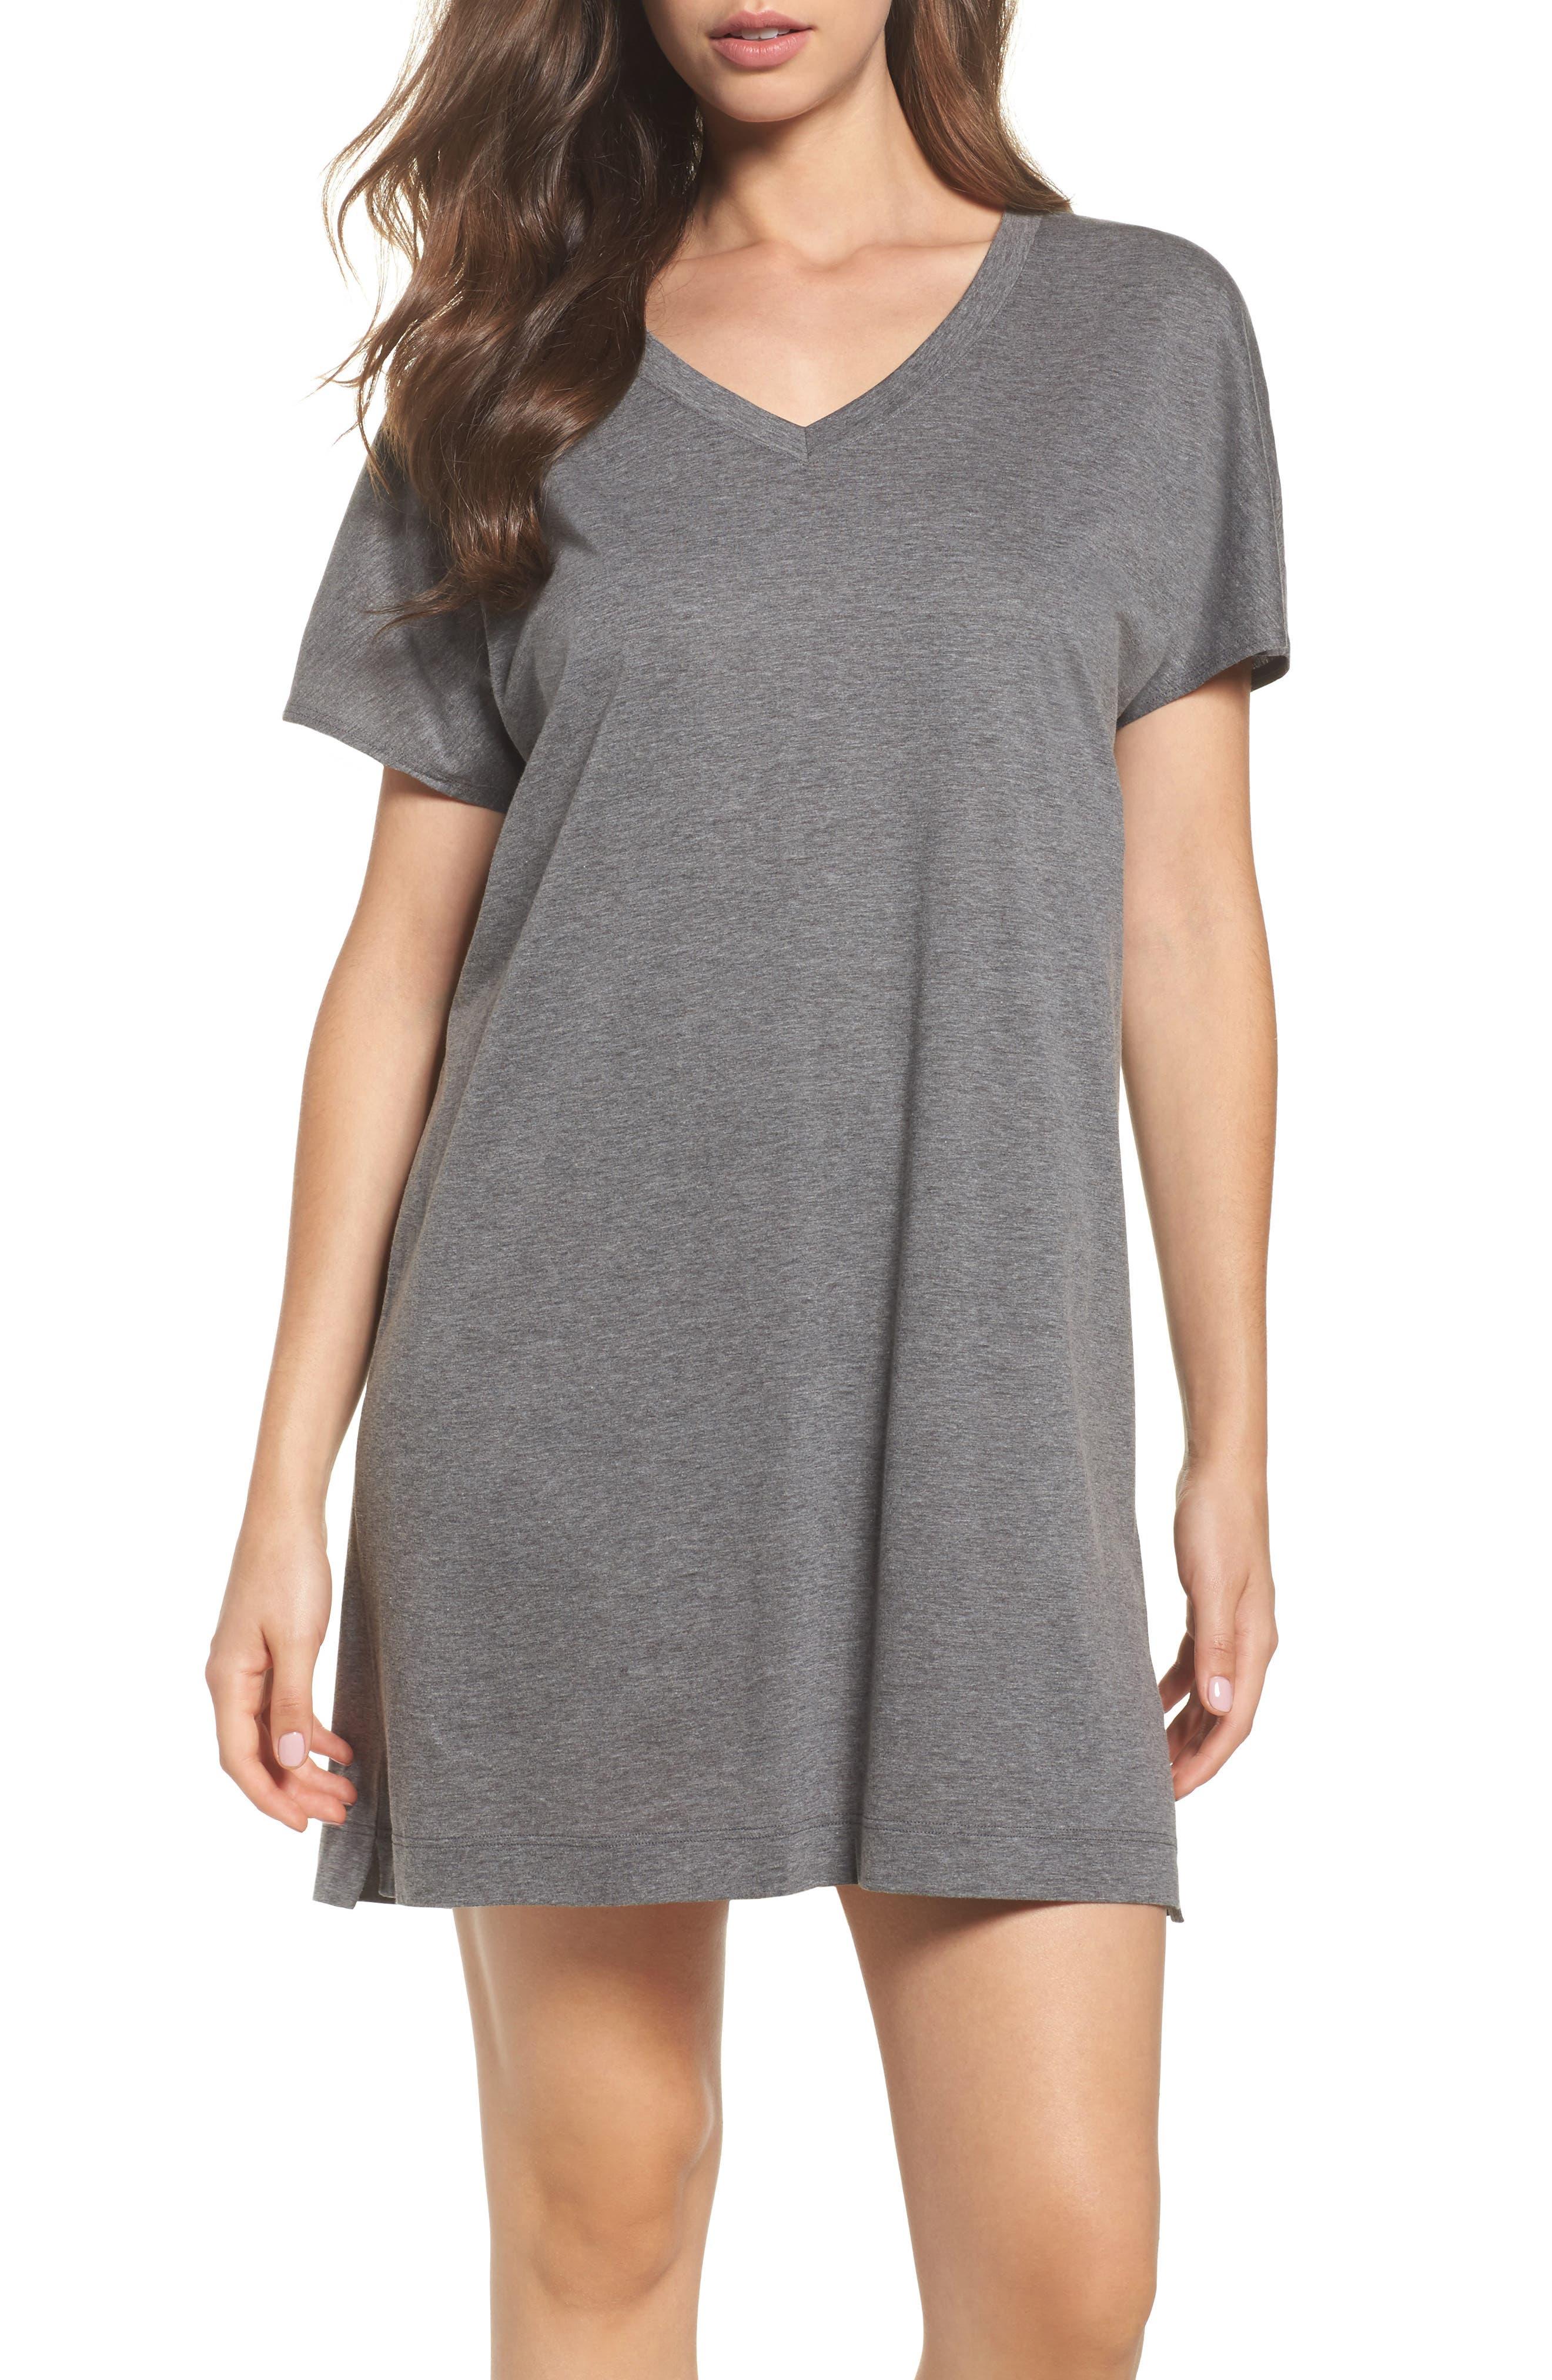 Laura Jersey Sleep Shirt,                         Main,                         color, 020